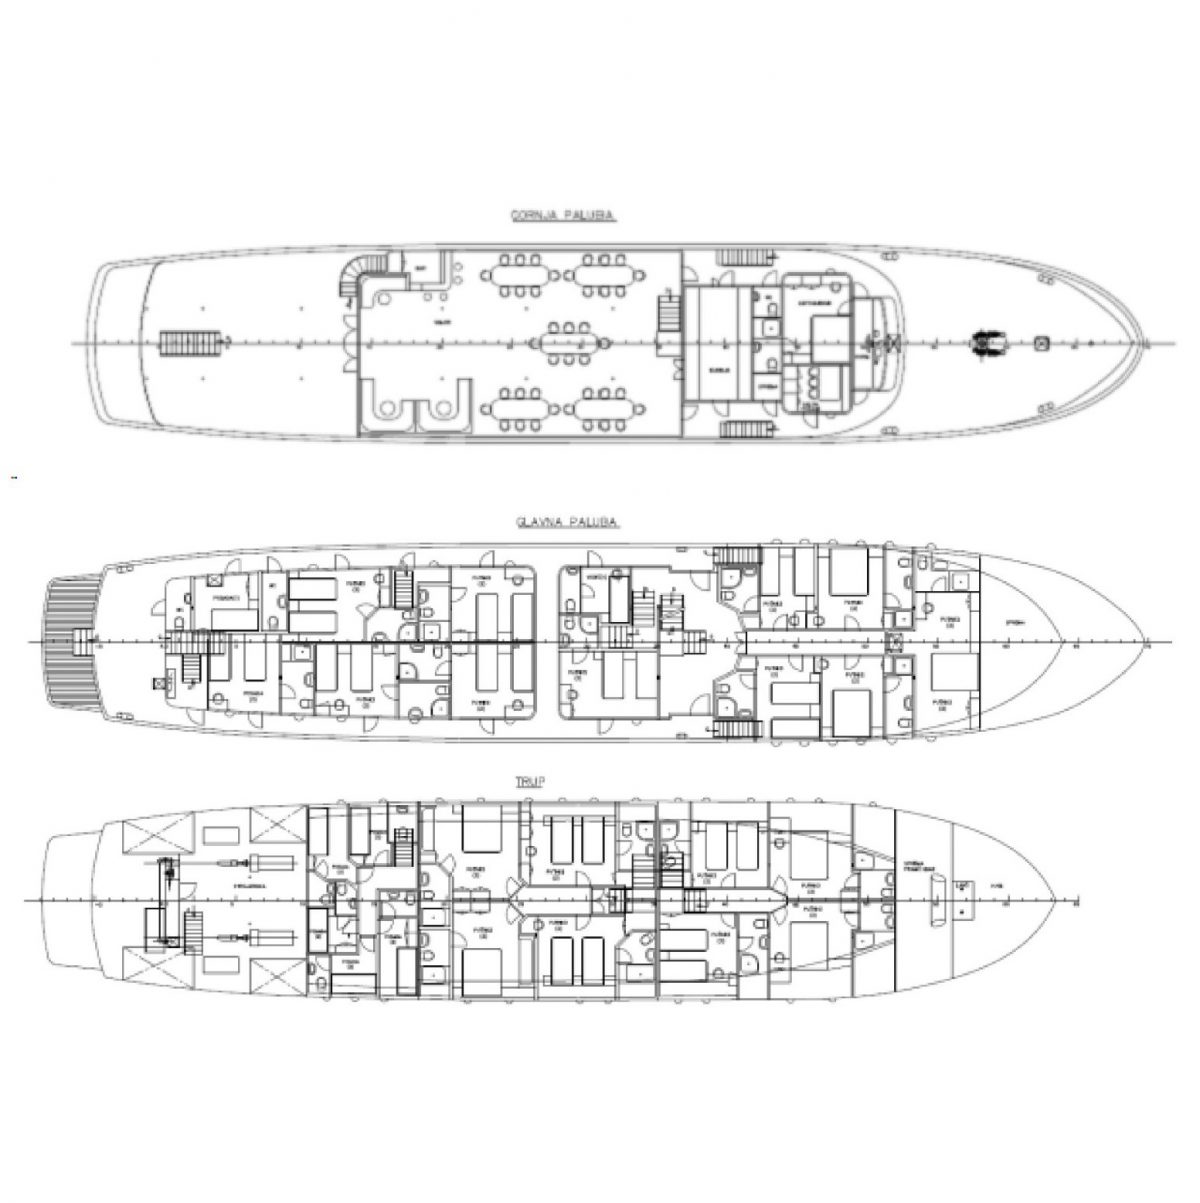 MS-Apolon-deck